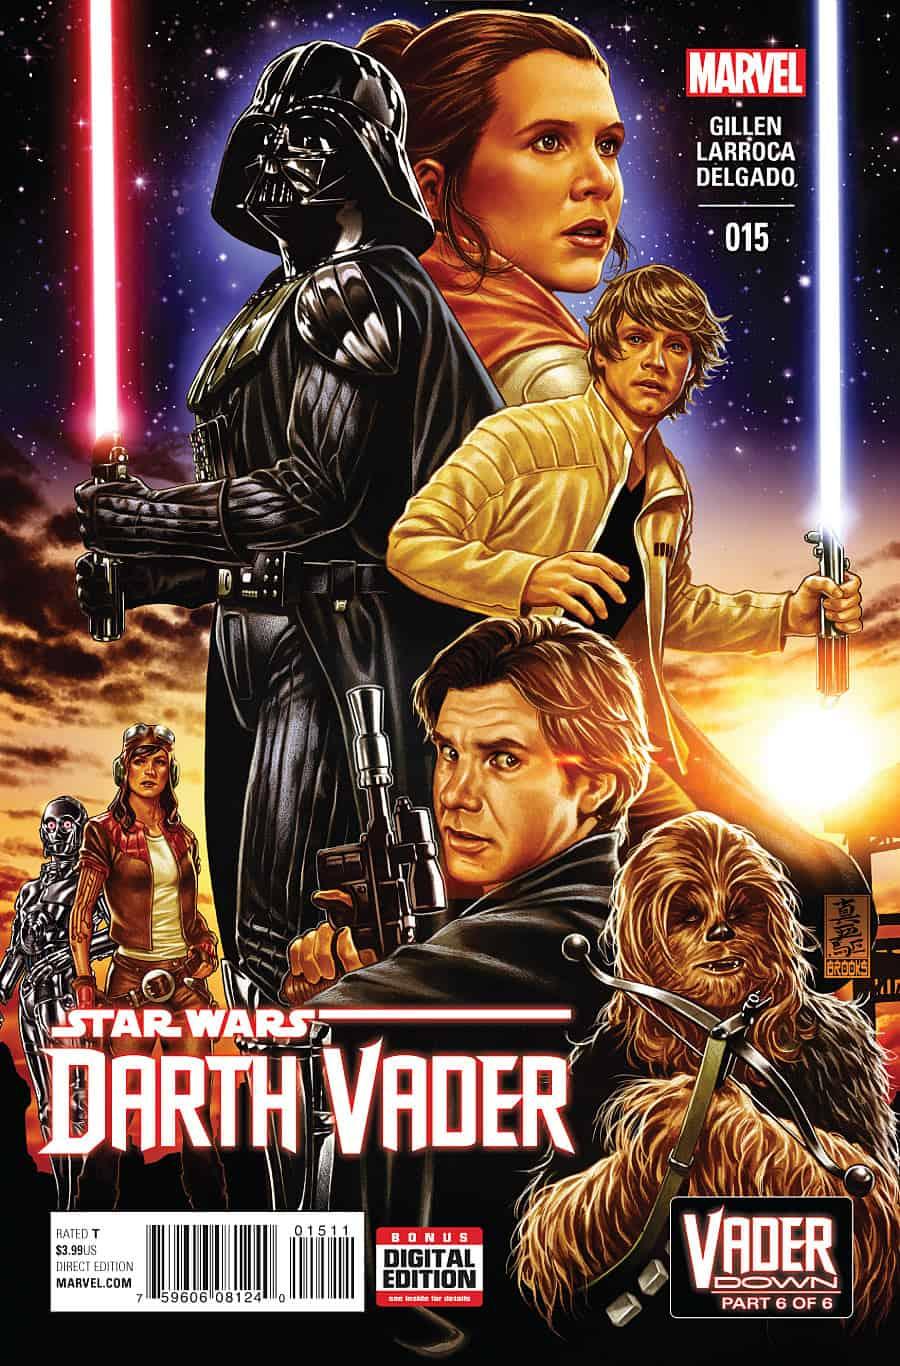 Darth Vader #15 - Cover